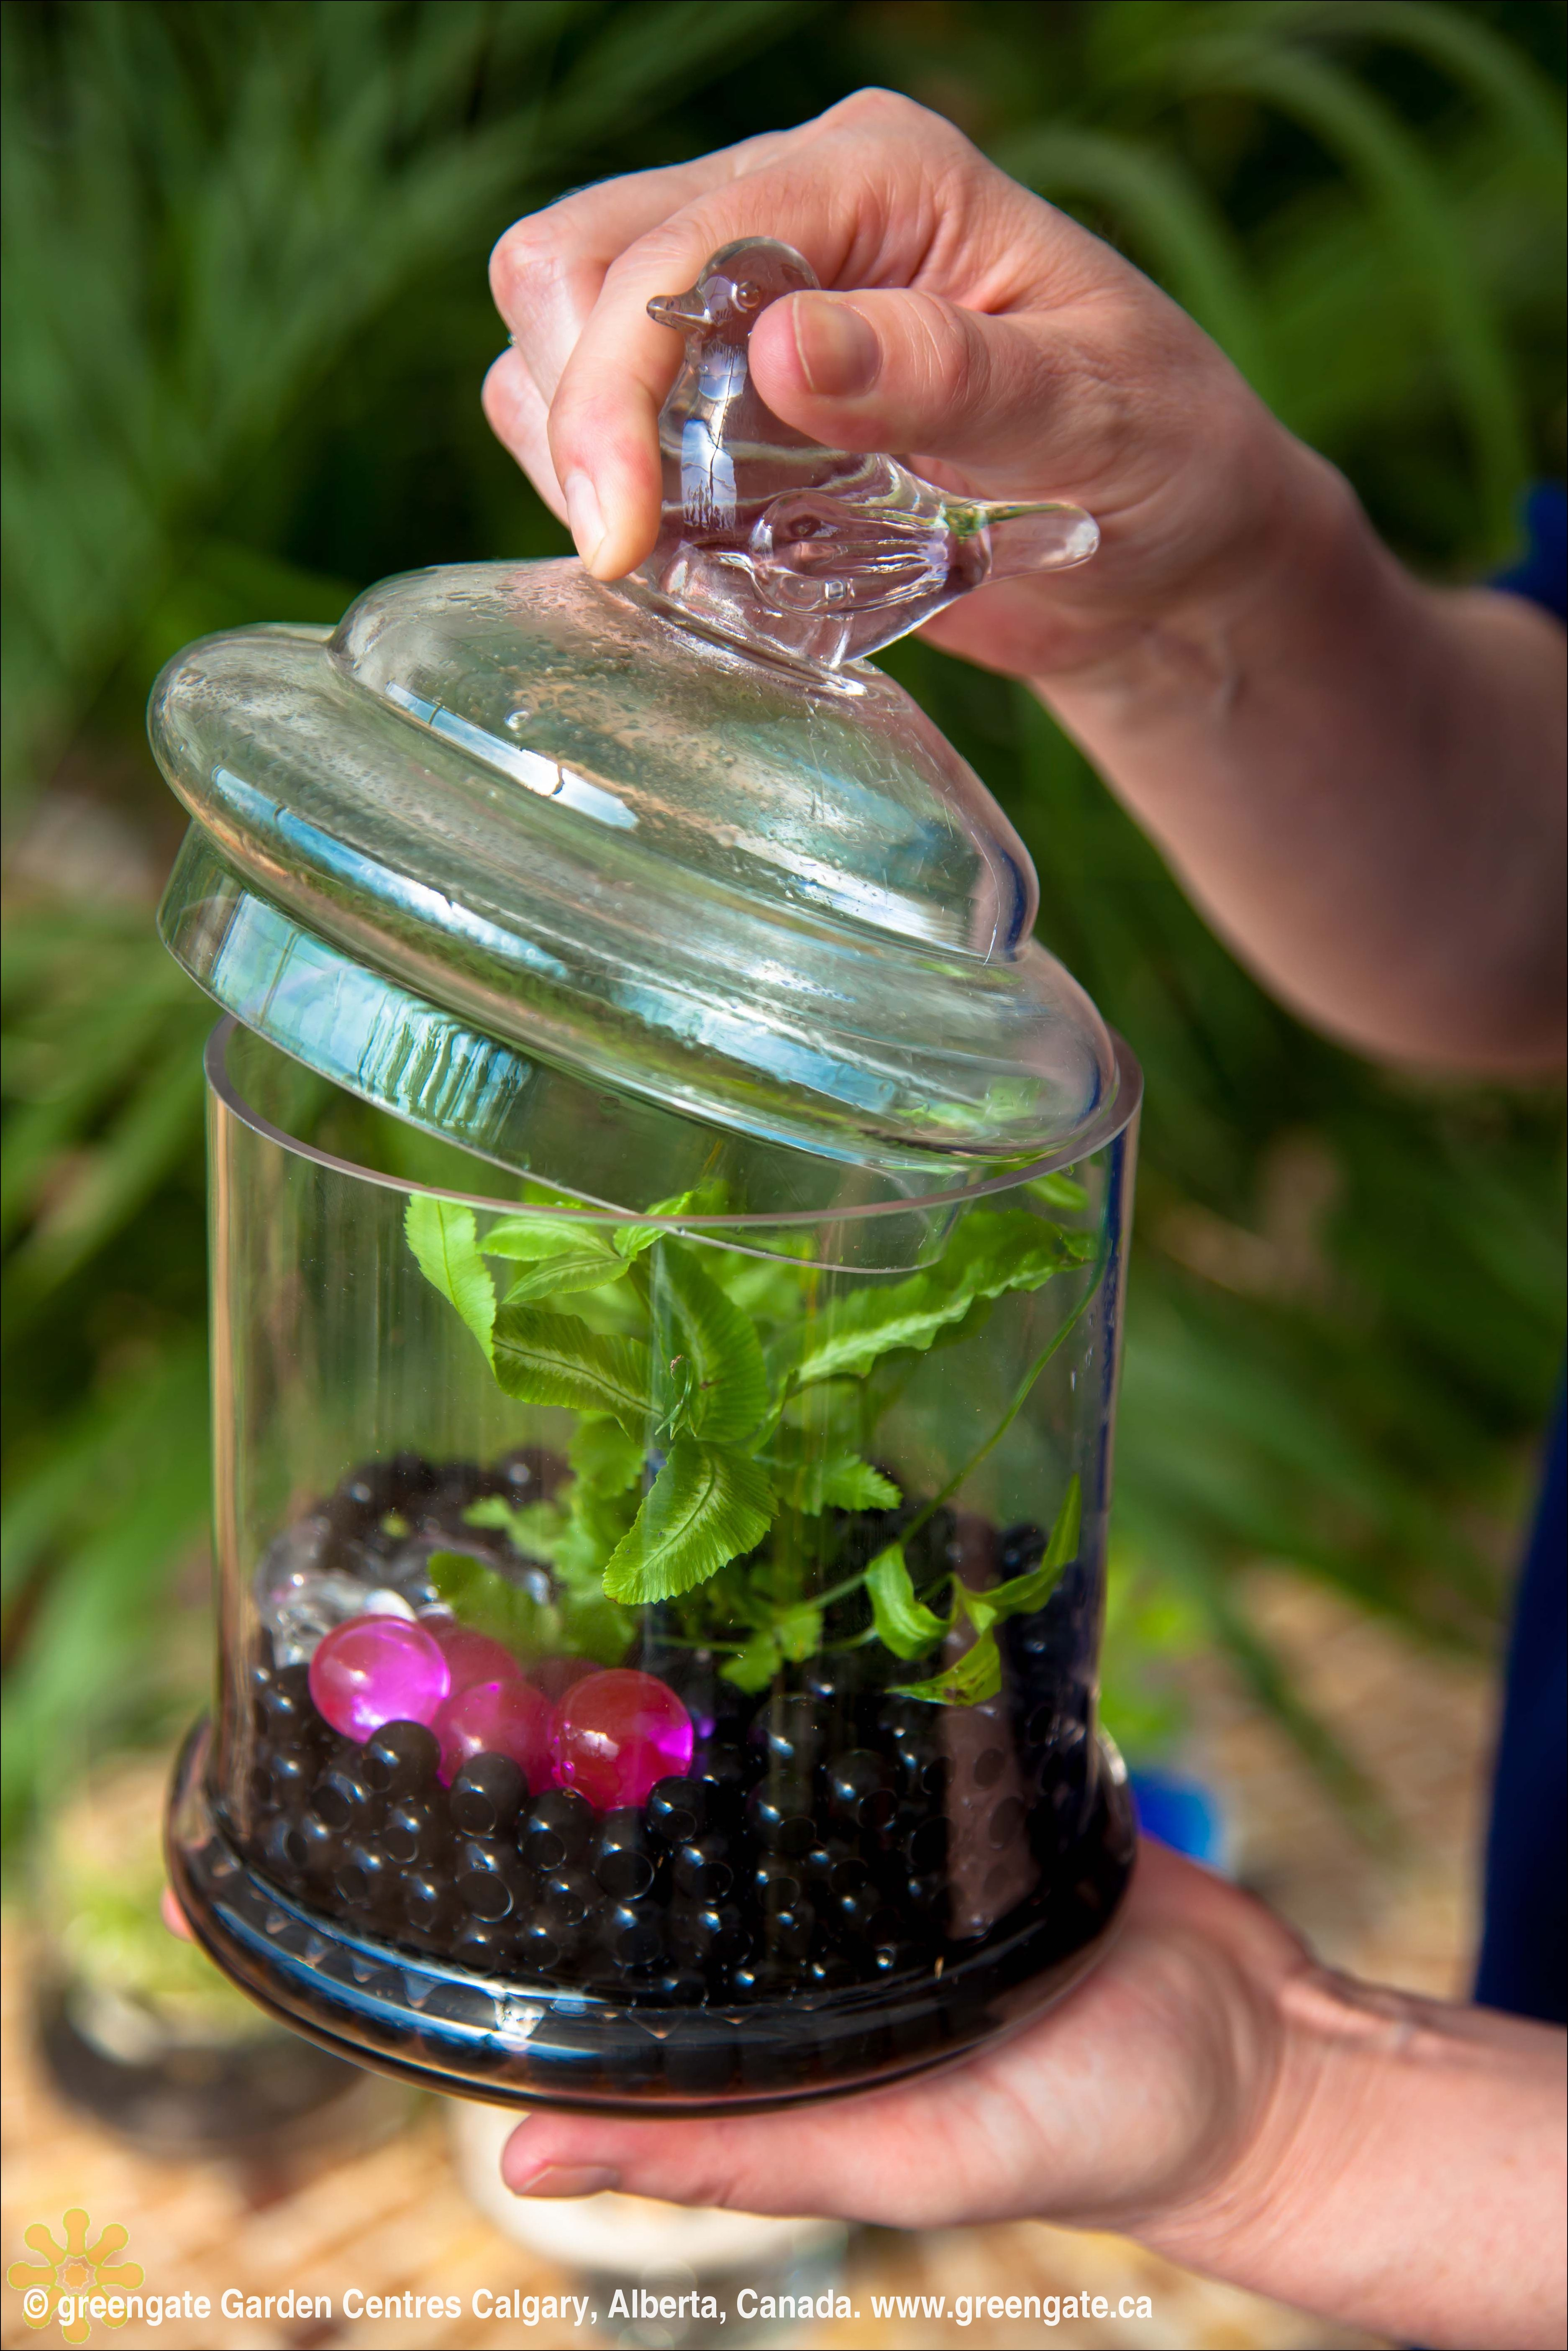 greengate Garden Centres terrarium. Healthy plants